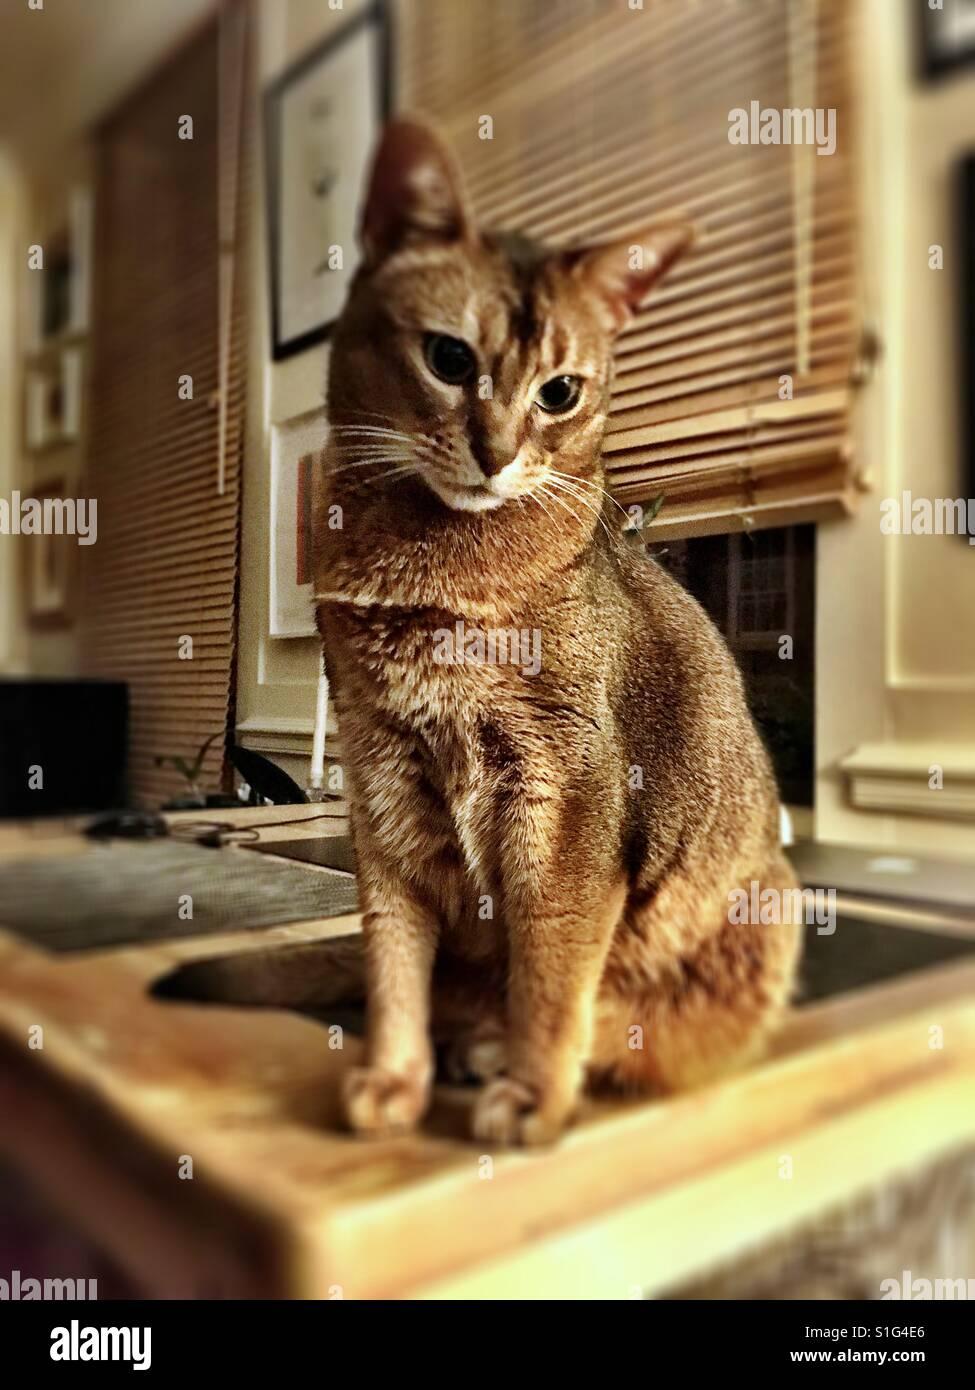 Abyssinian cat in sepia tones Stock Photo